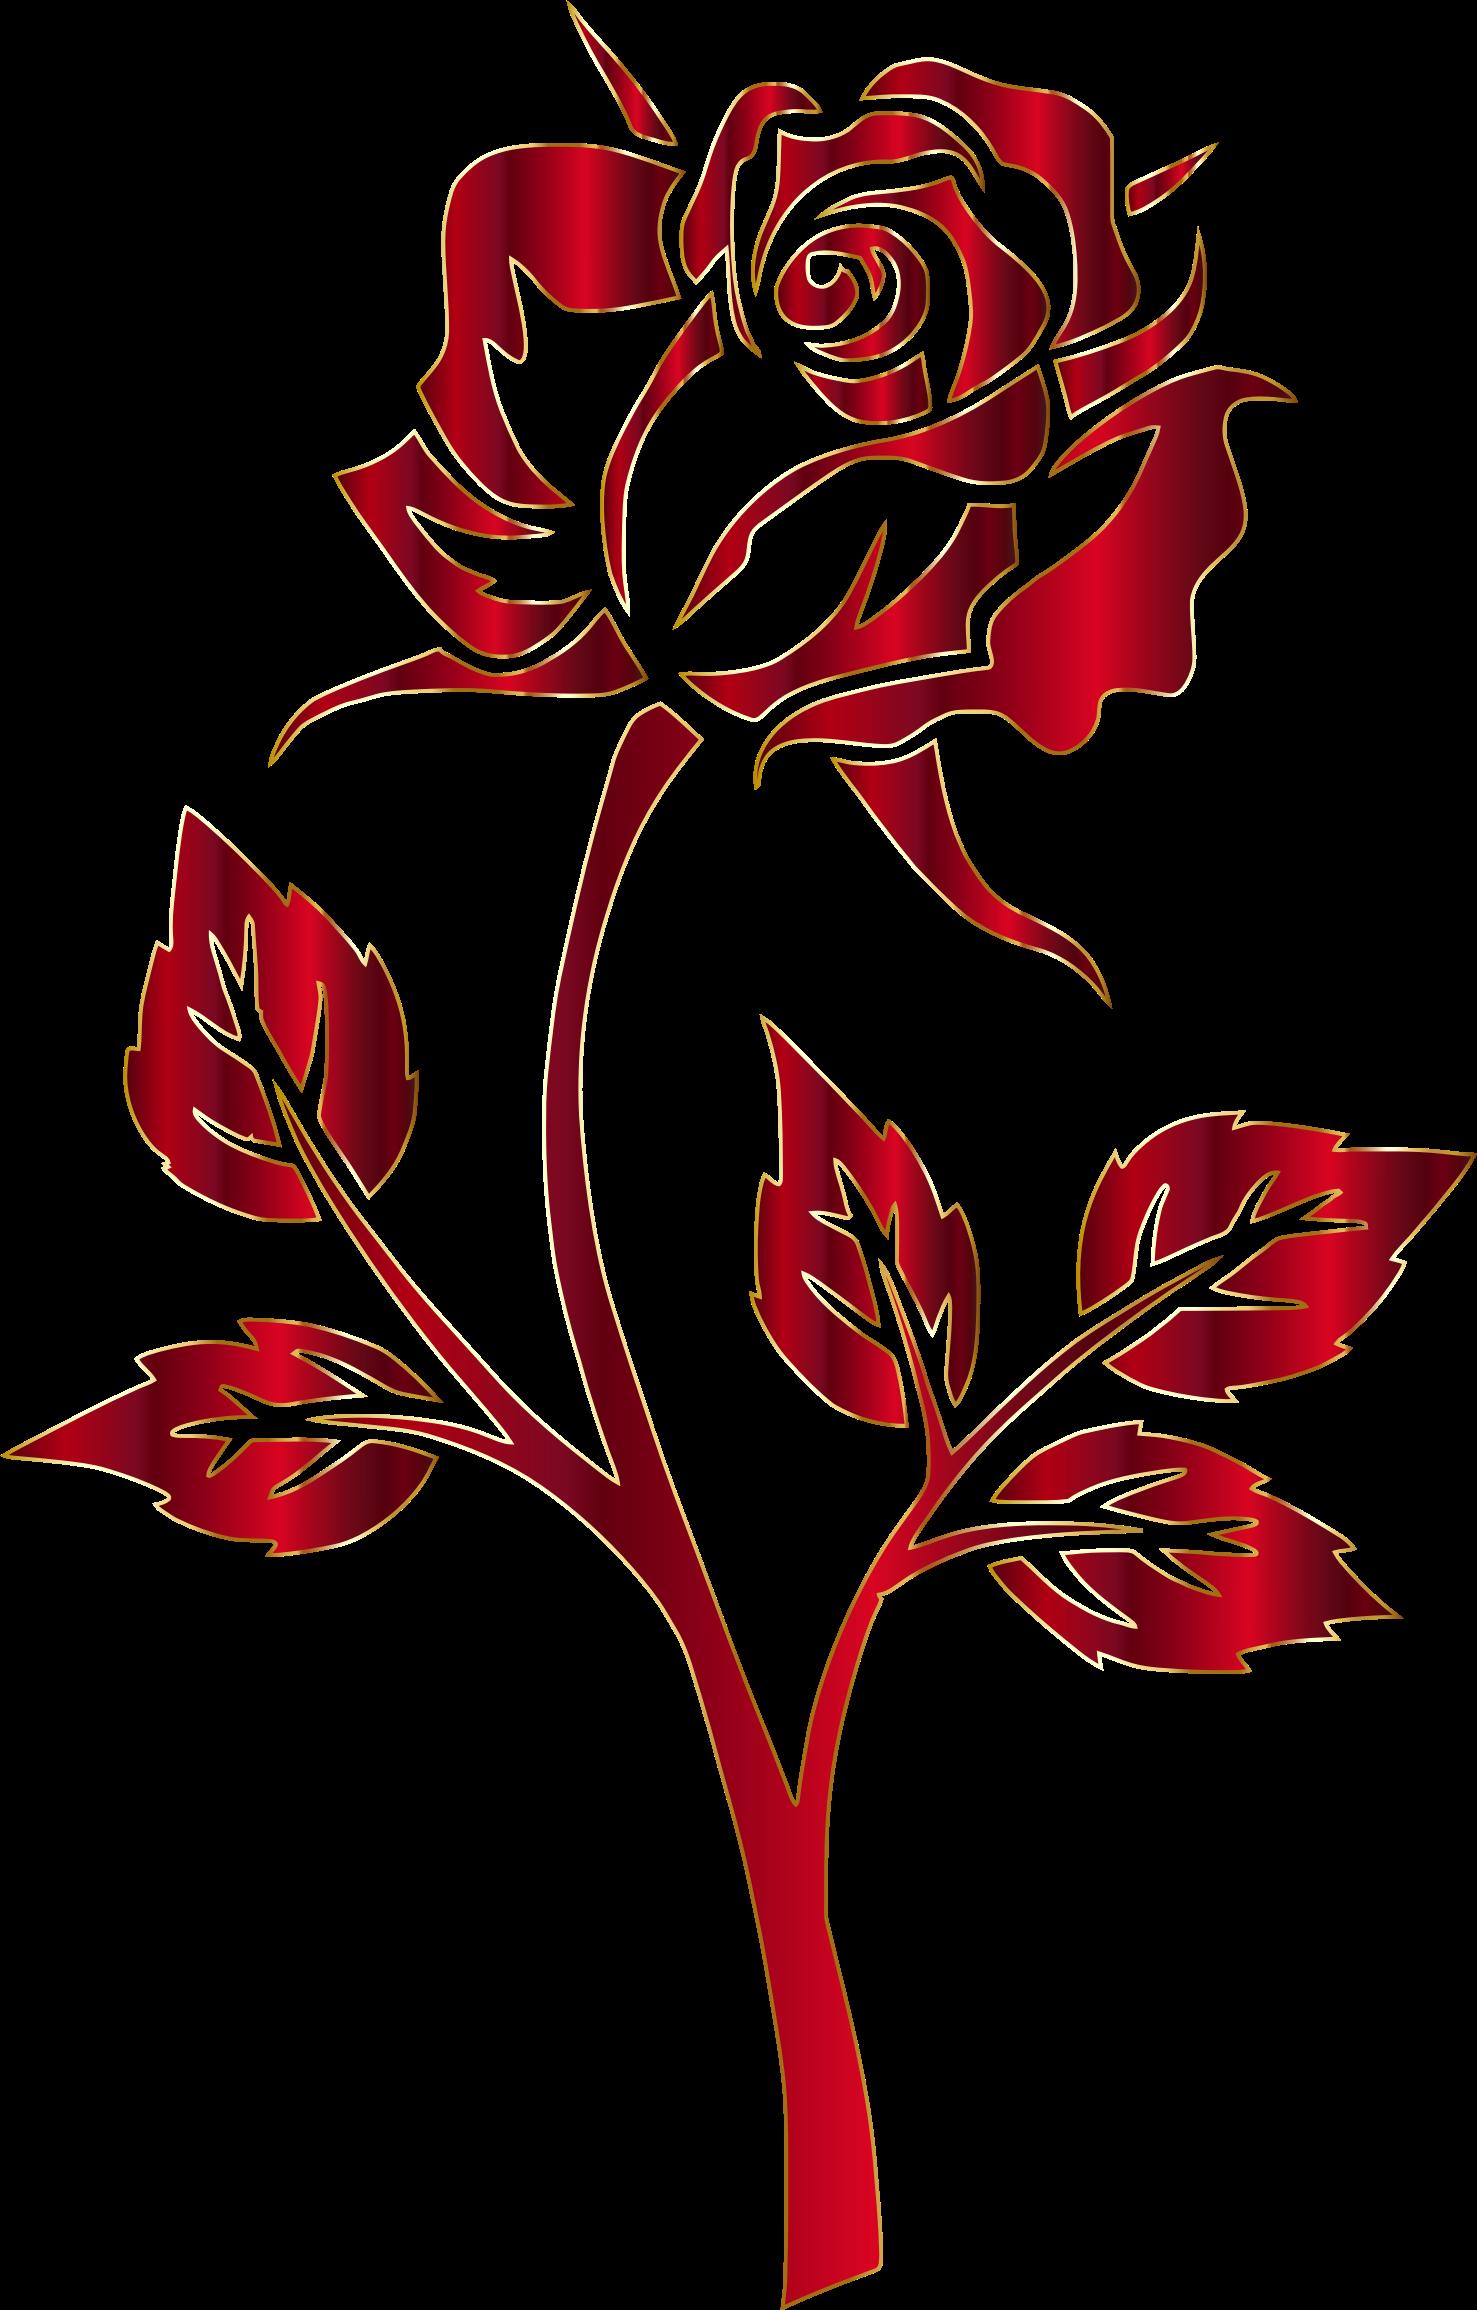 Vines clipart silhouette. Crimson rose no background